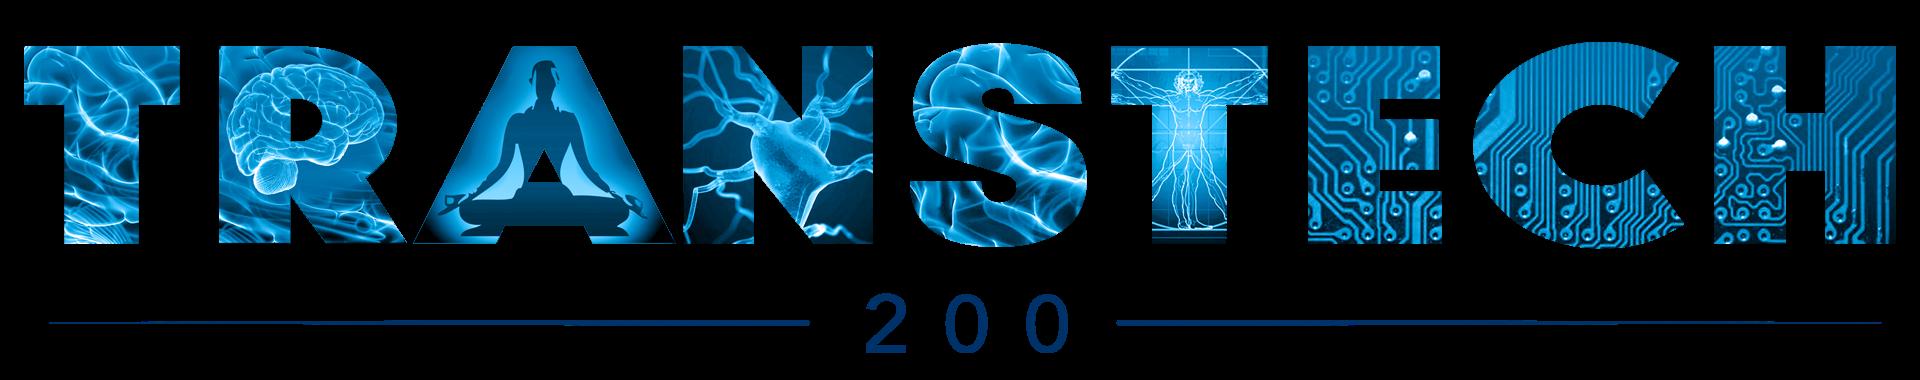 TransTech200